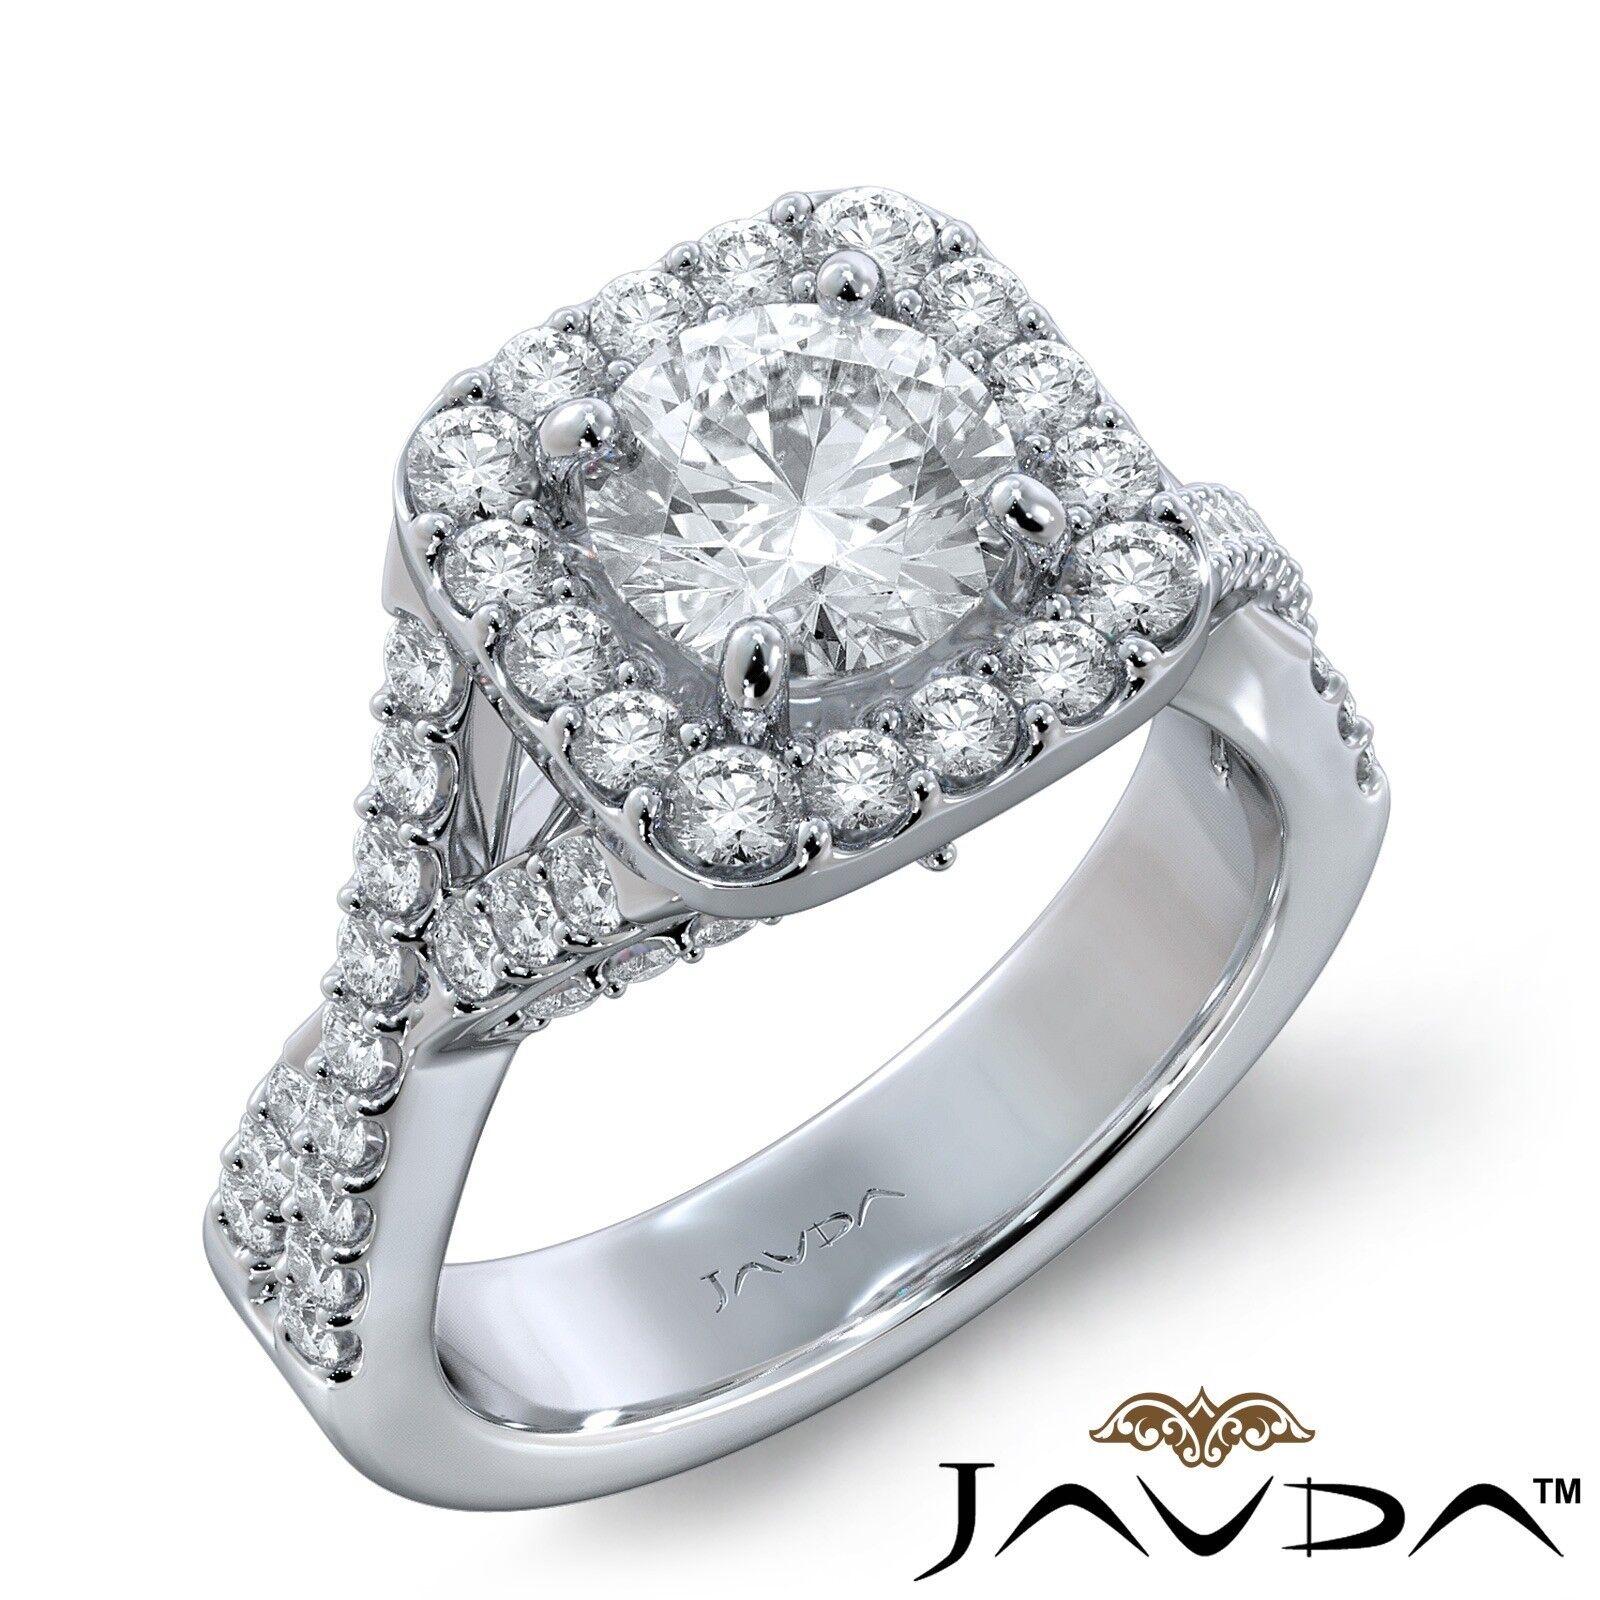 2.8ct Cross Shank Halo Bridge Round Diamond Engagement Ring GIA E-VS1 White Gold